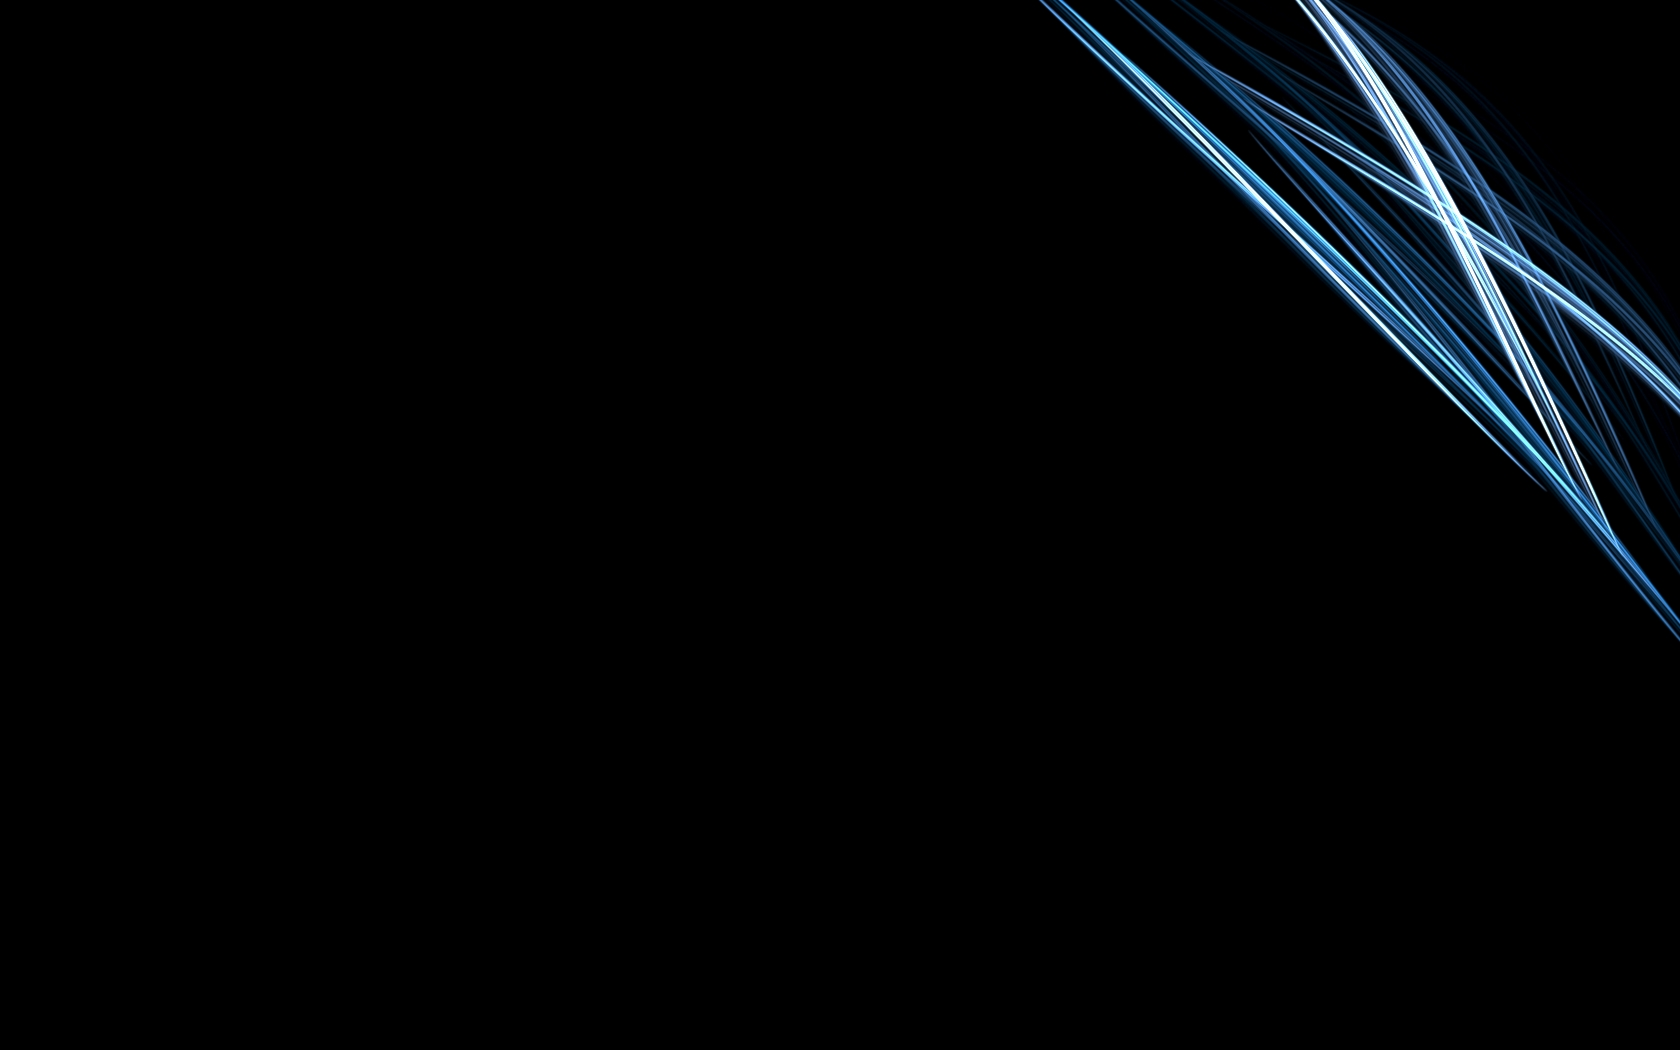 black blue abstract wallpaper 2026 hd wallpapersjpg 1680x1050